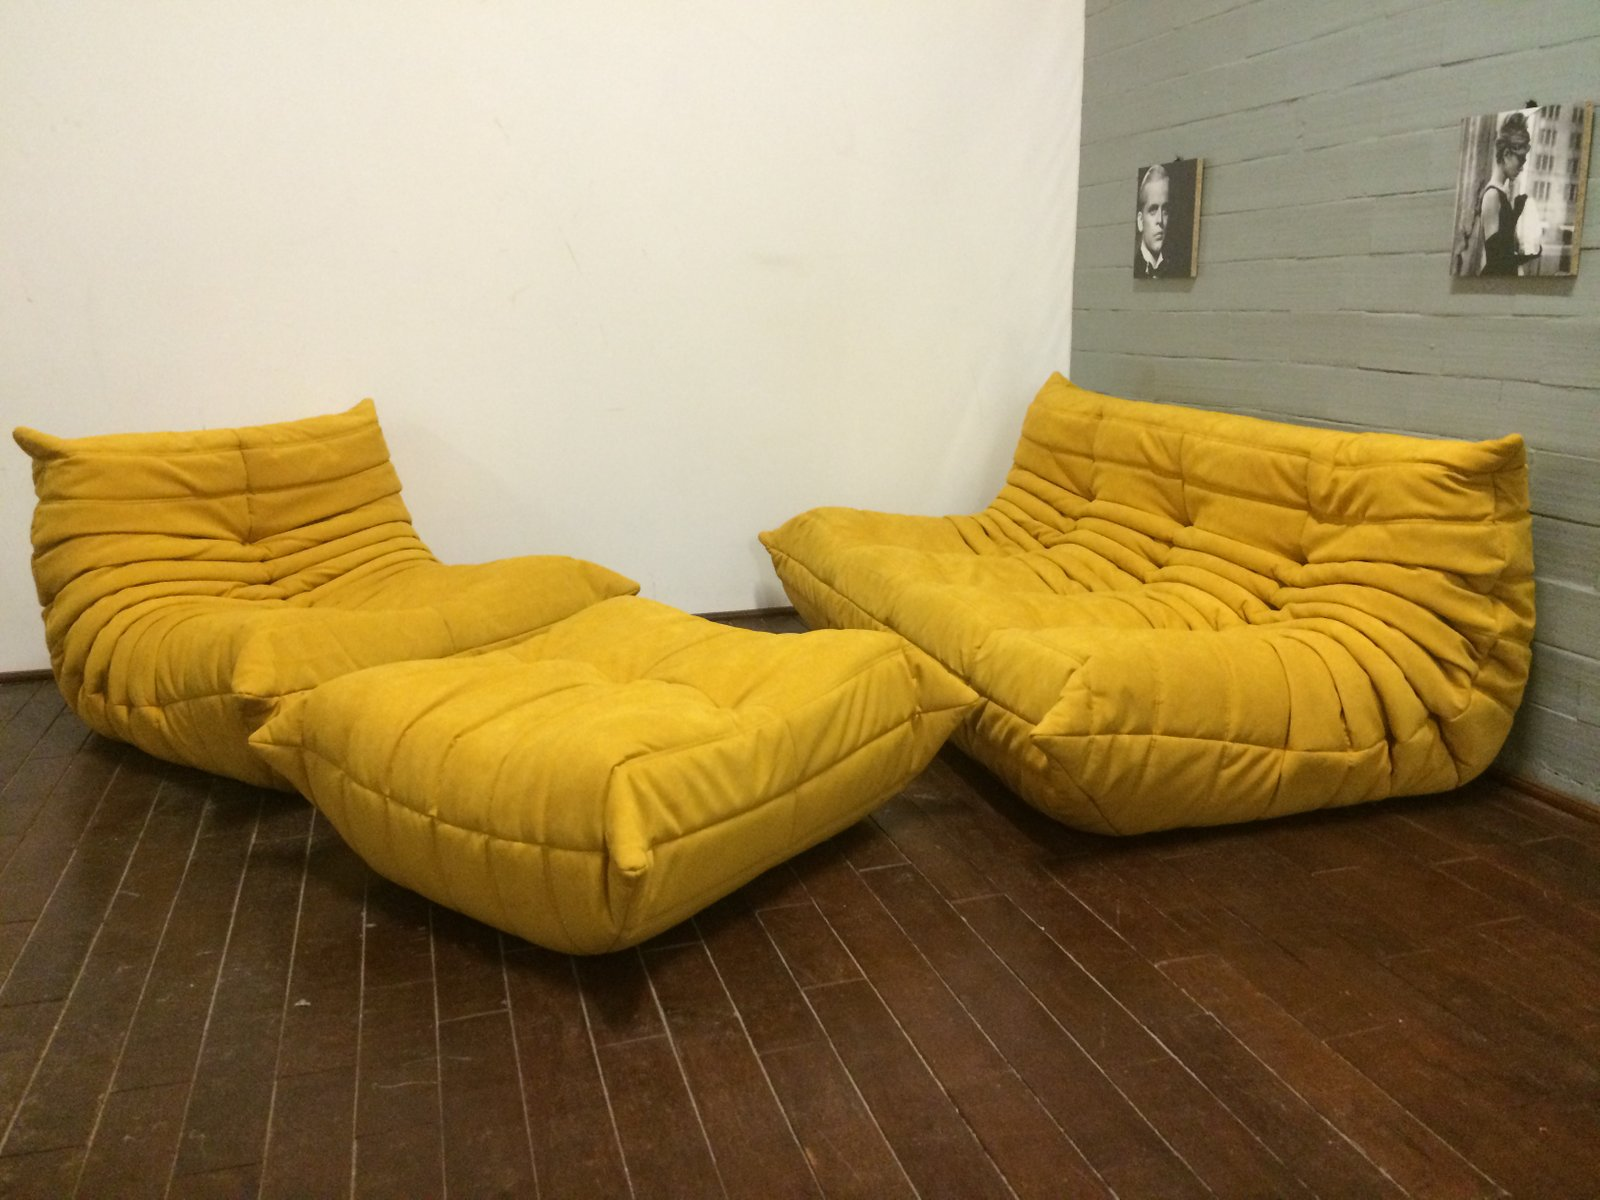 gelbes alcantara togo sofa set von michel ducaroy f r ligne roset 1970er 3er set bei pamono kaufen. Black Bedroom Furniture Sets. Home Design Ideas